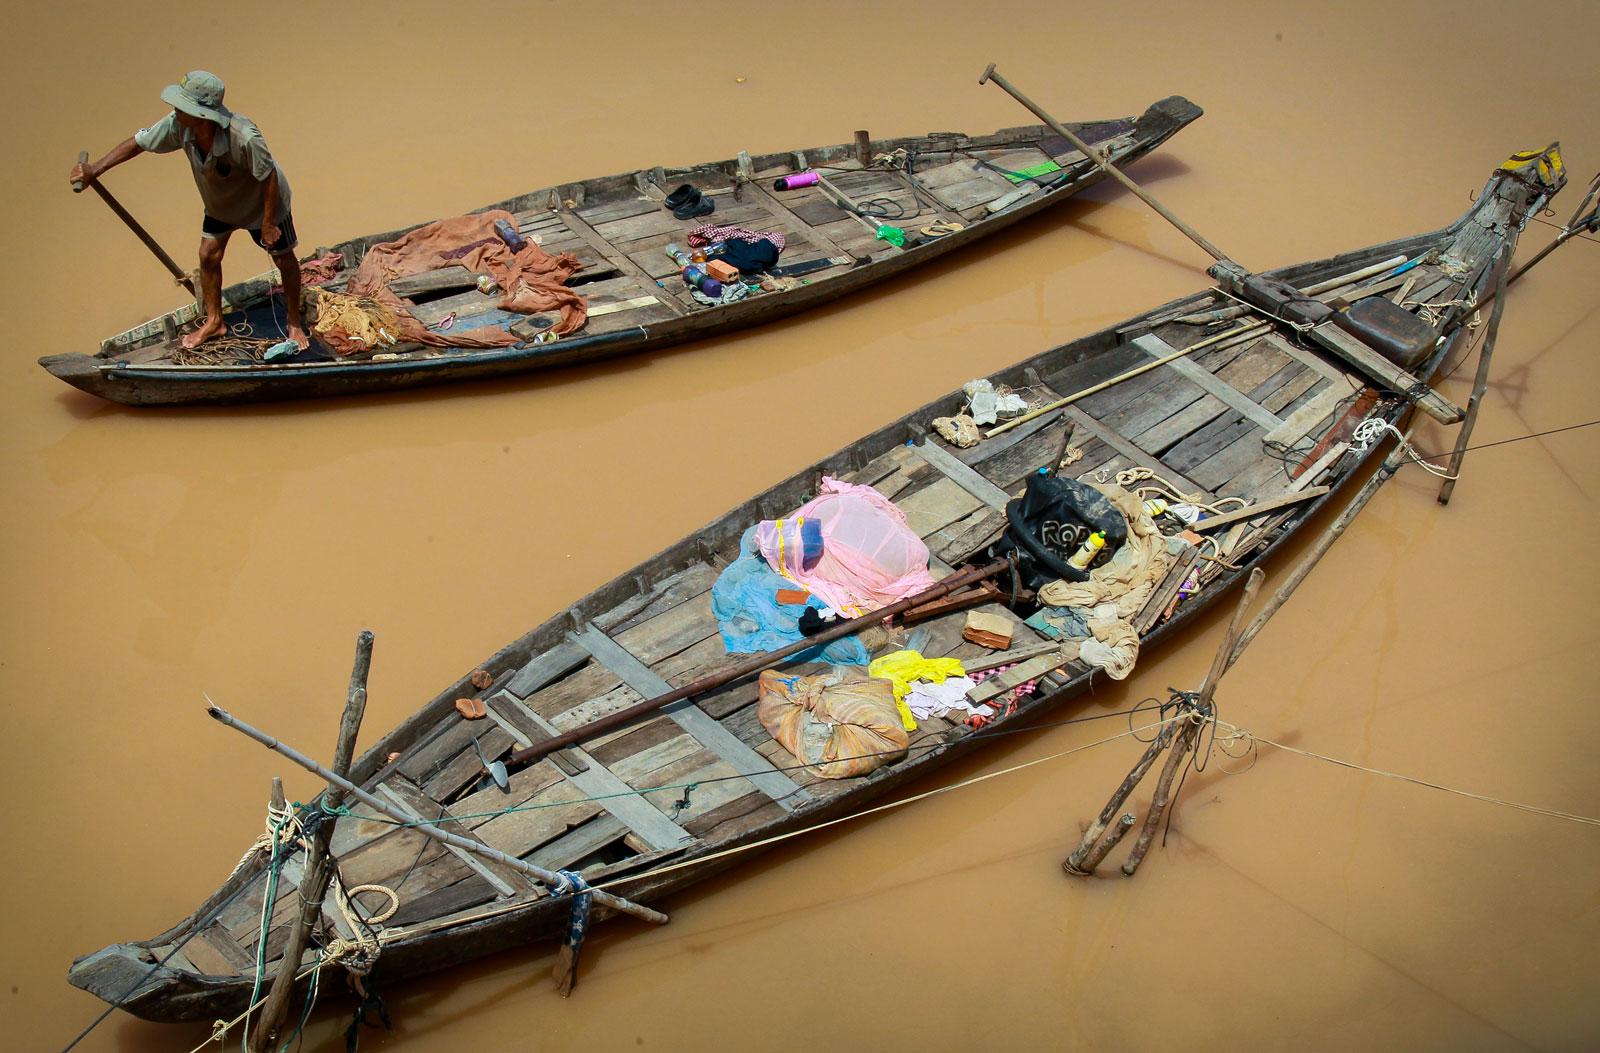 A fisherman on the Mekong River in Phnom Penh. Photo: EPA/Mak Remissa